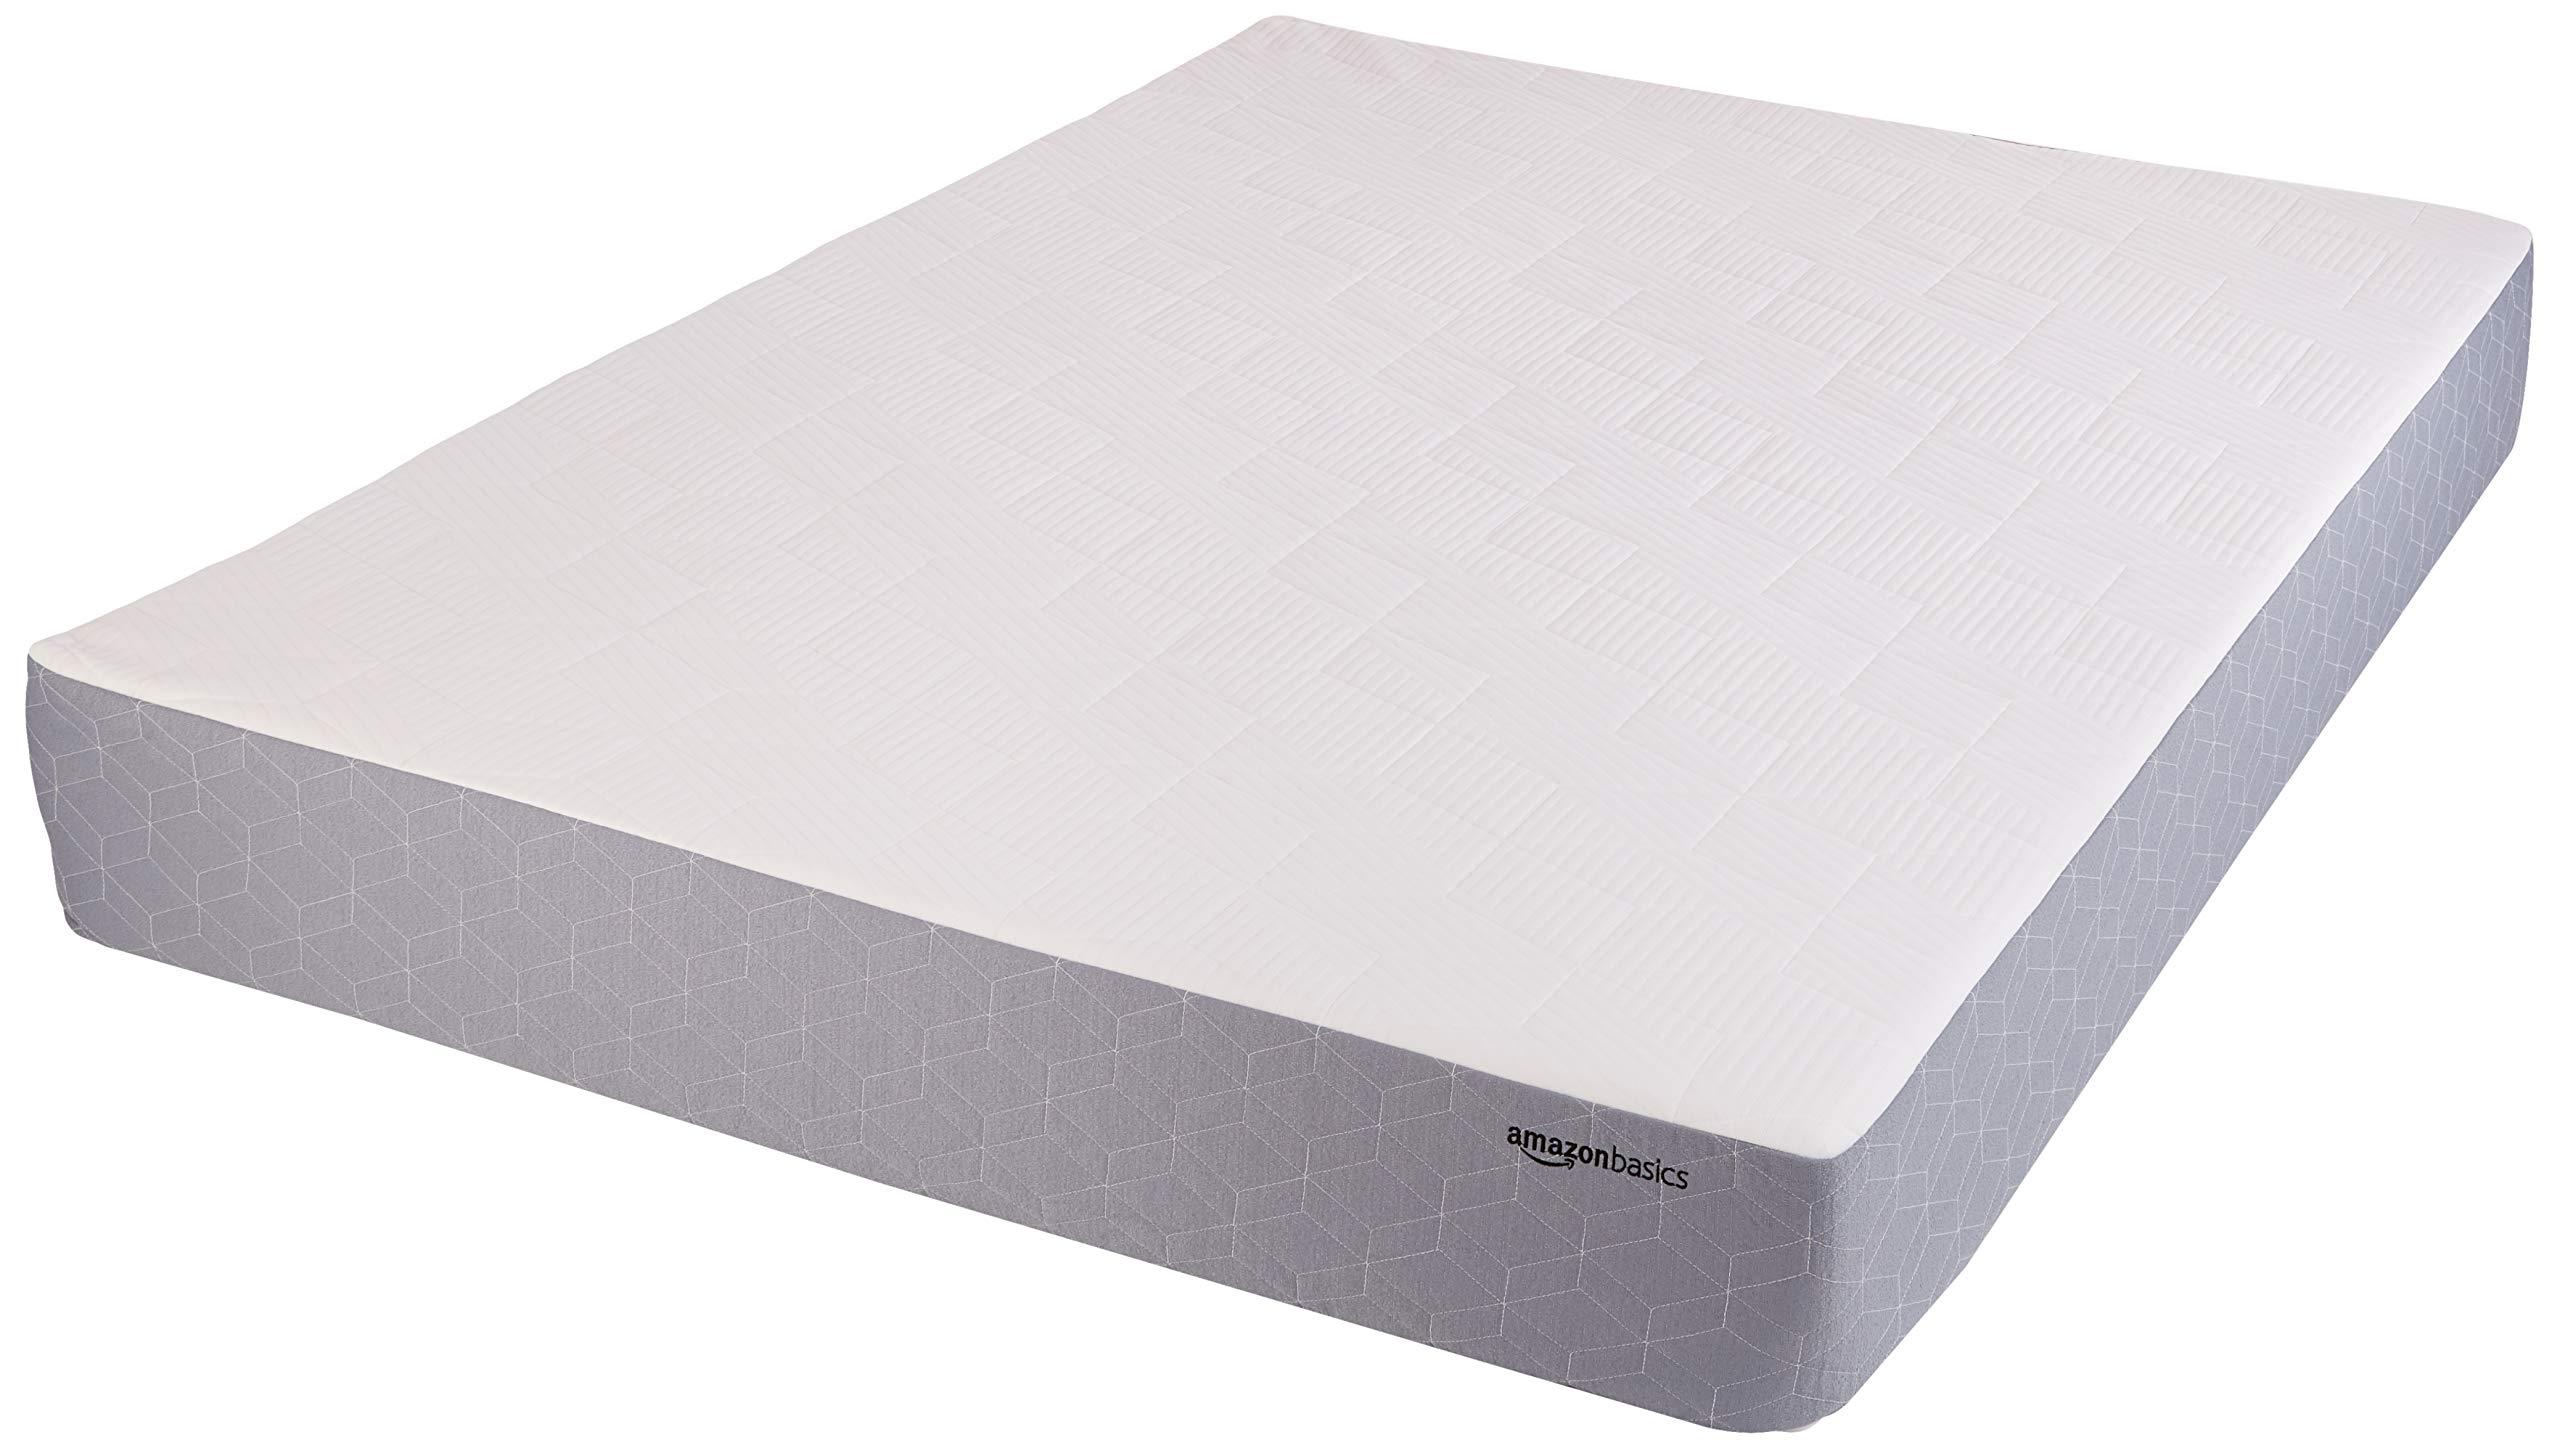 AmazonBasics Cooling Gel-Infused Memory Foam Mattress - Medium Firmness, CertiPUR-US Certified - 10 Inch, Twin